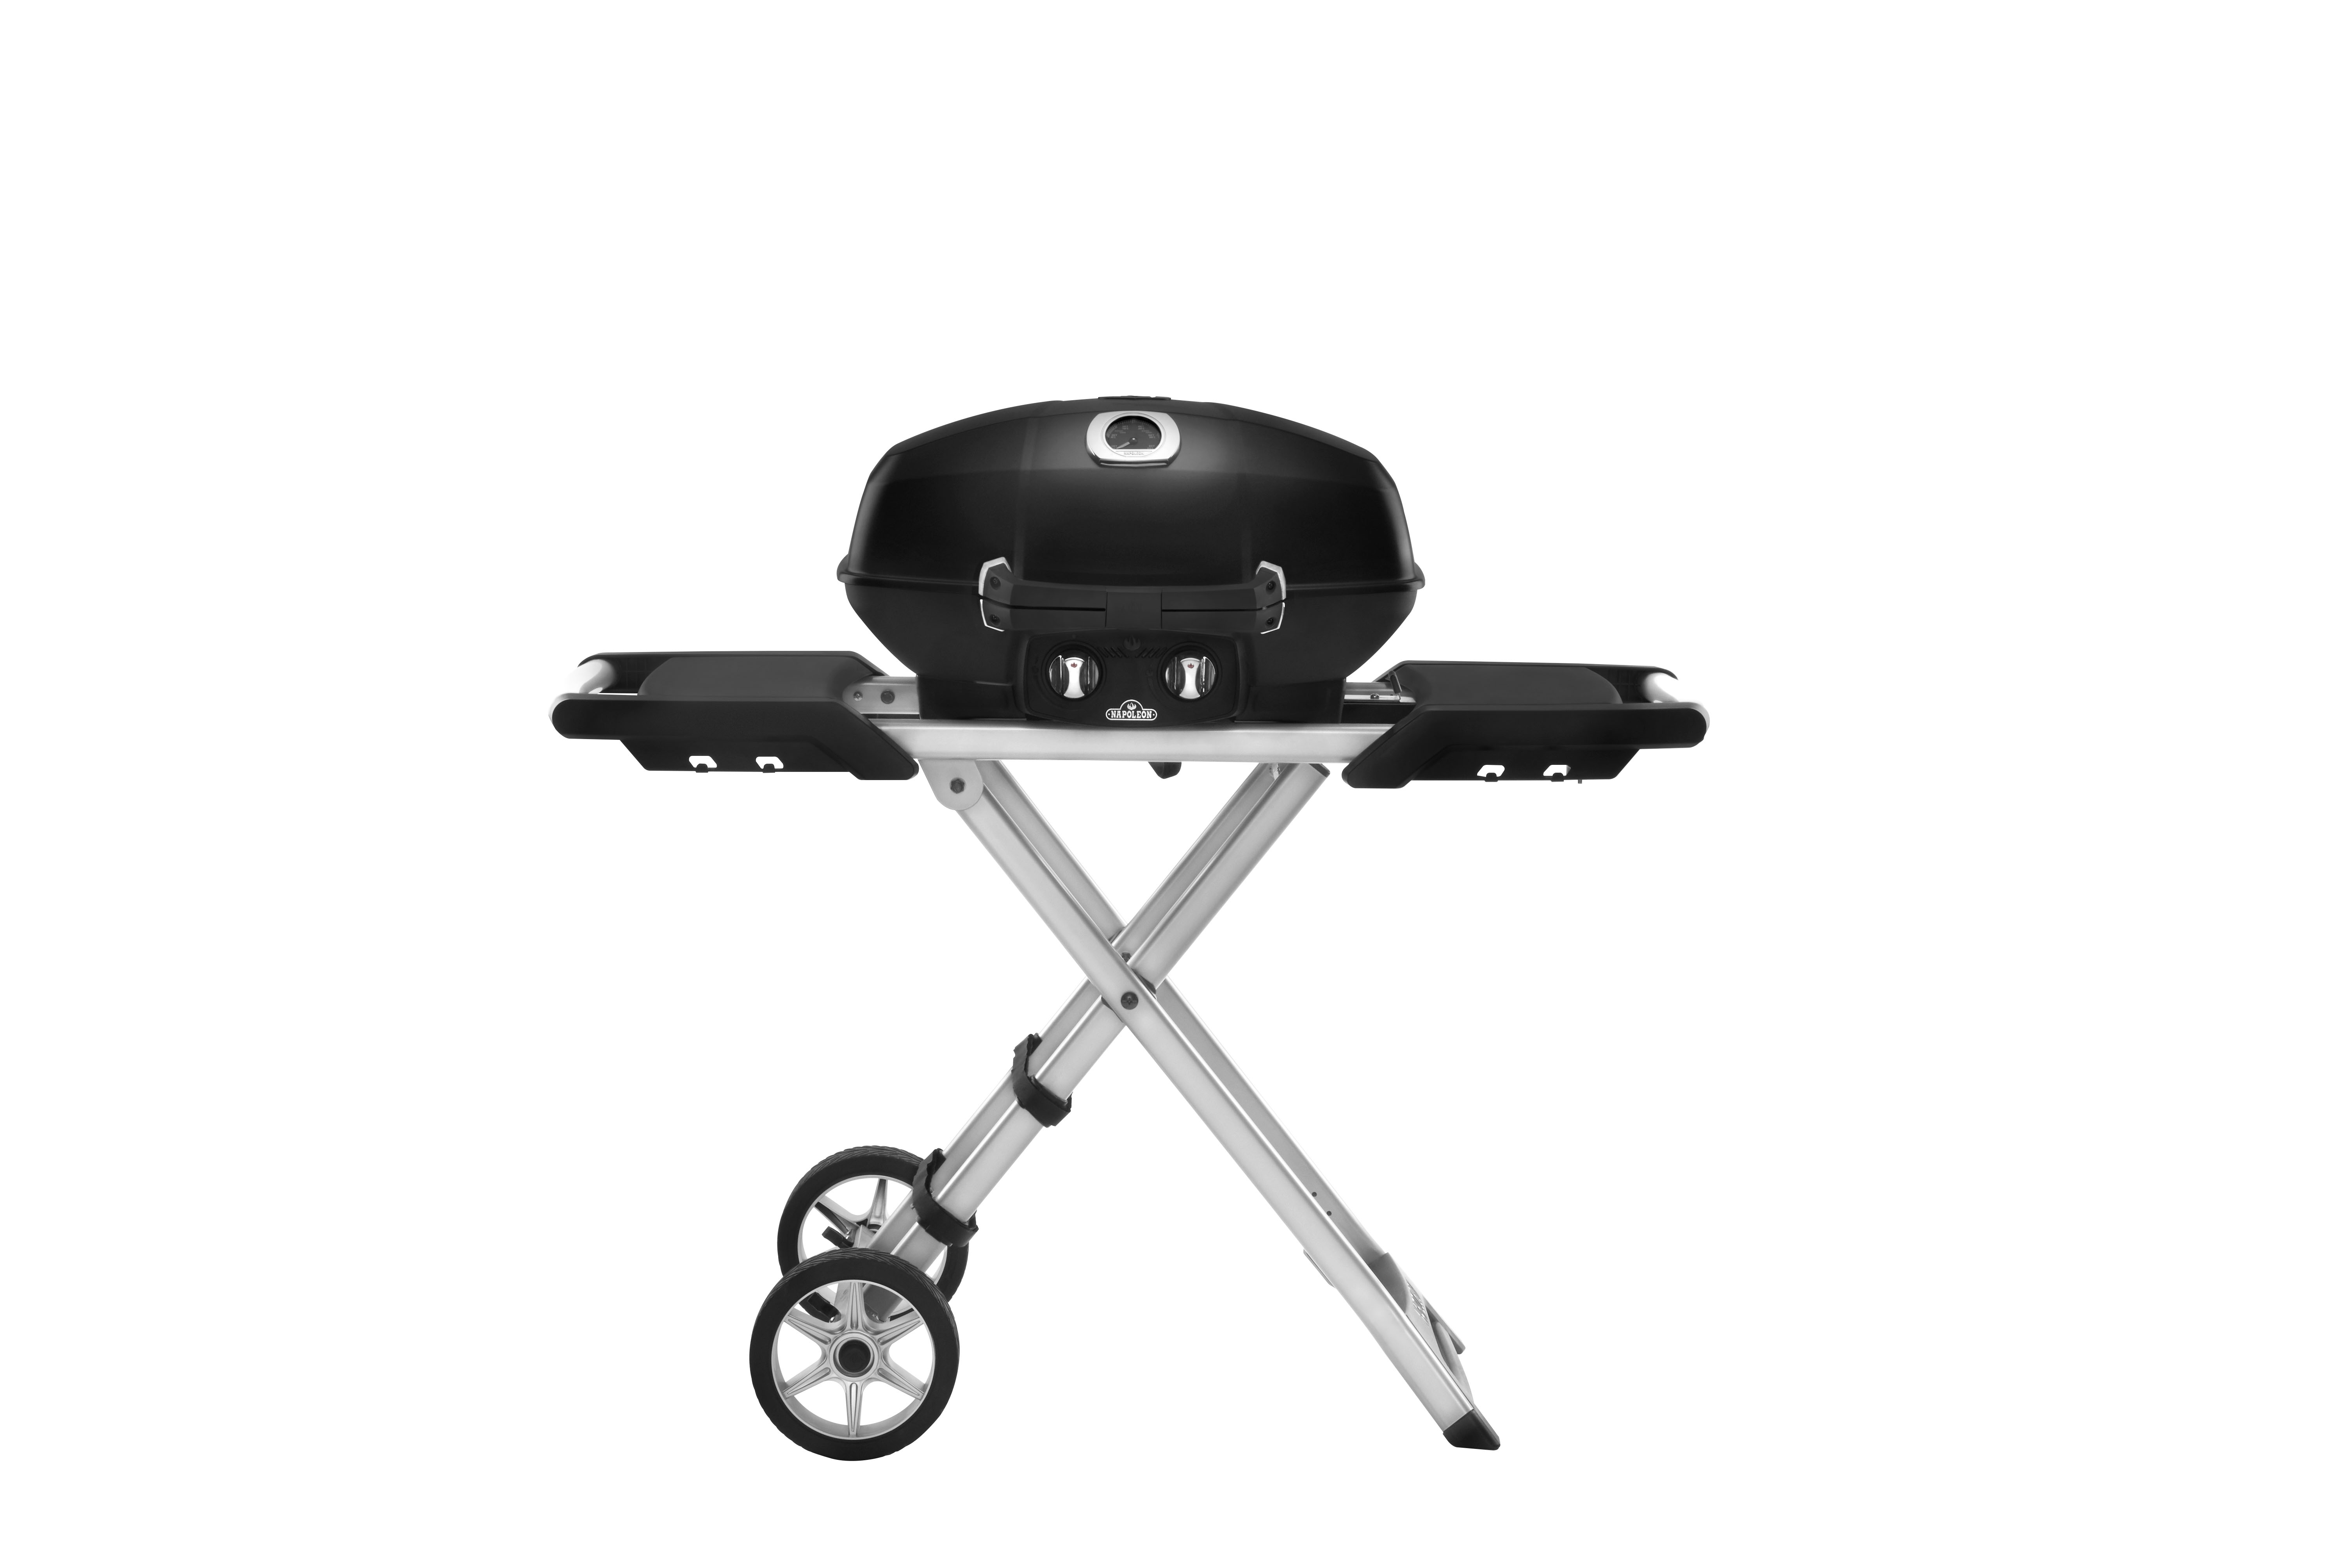 Napoleon Holzkohlegrill Kaufen : Grill napoleon grill co